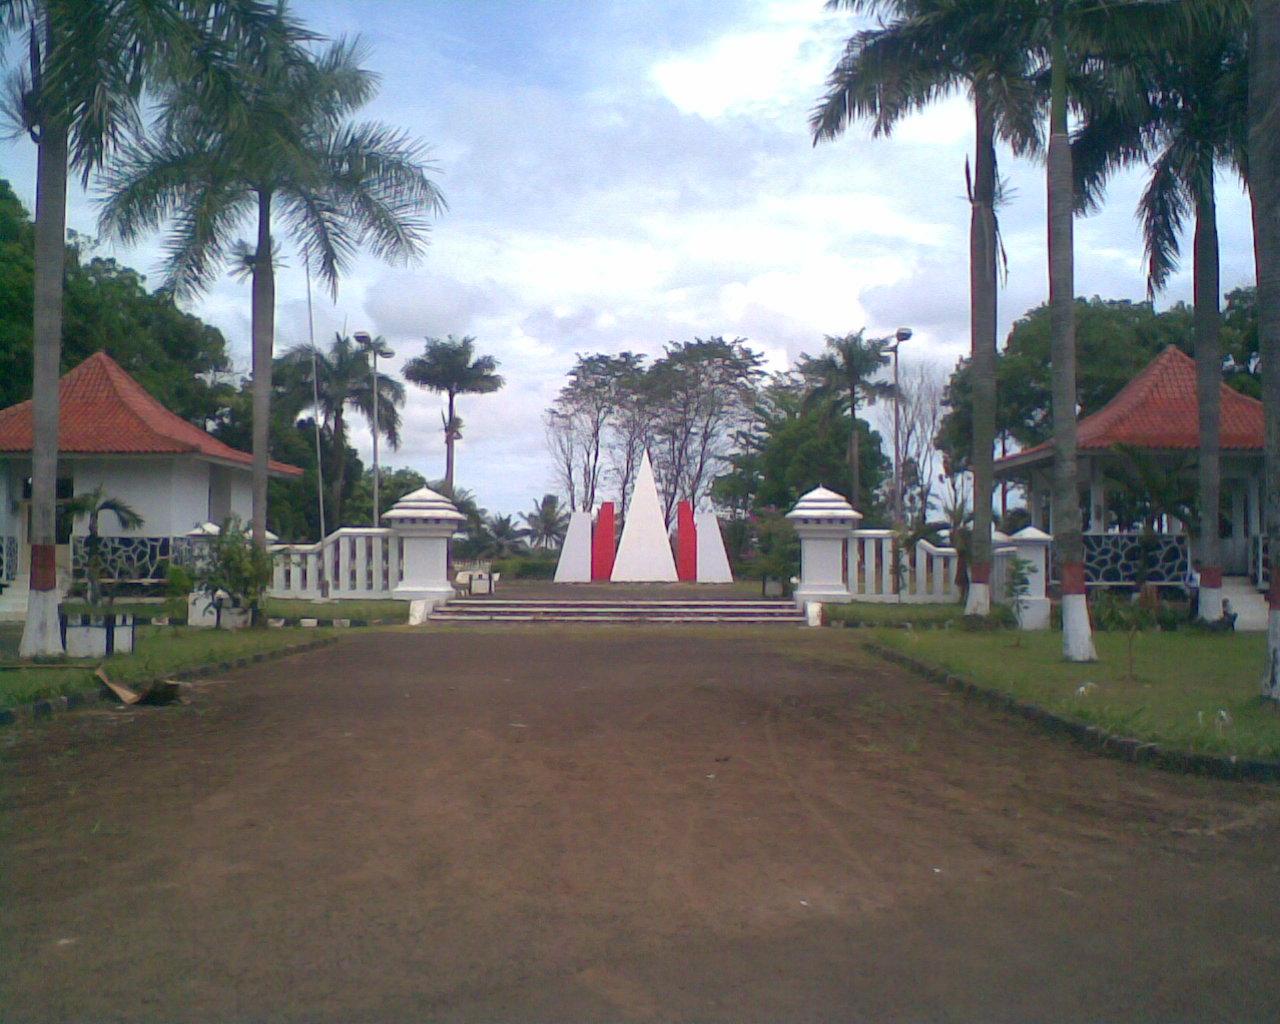 Eksplorasi Tempat Bersejarah Tangerang Taman Makam Pahlawan Seribu Monumen Lengkong